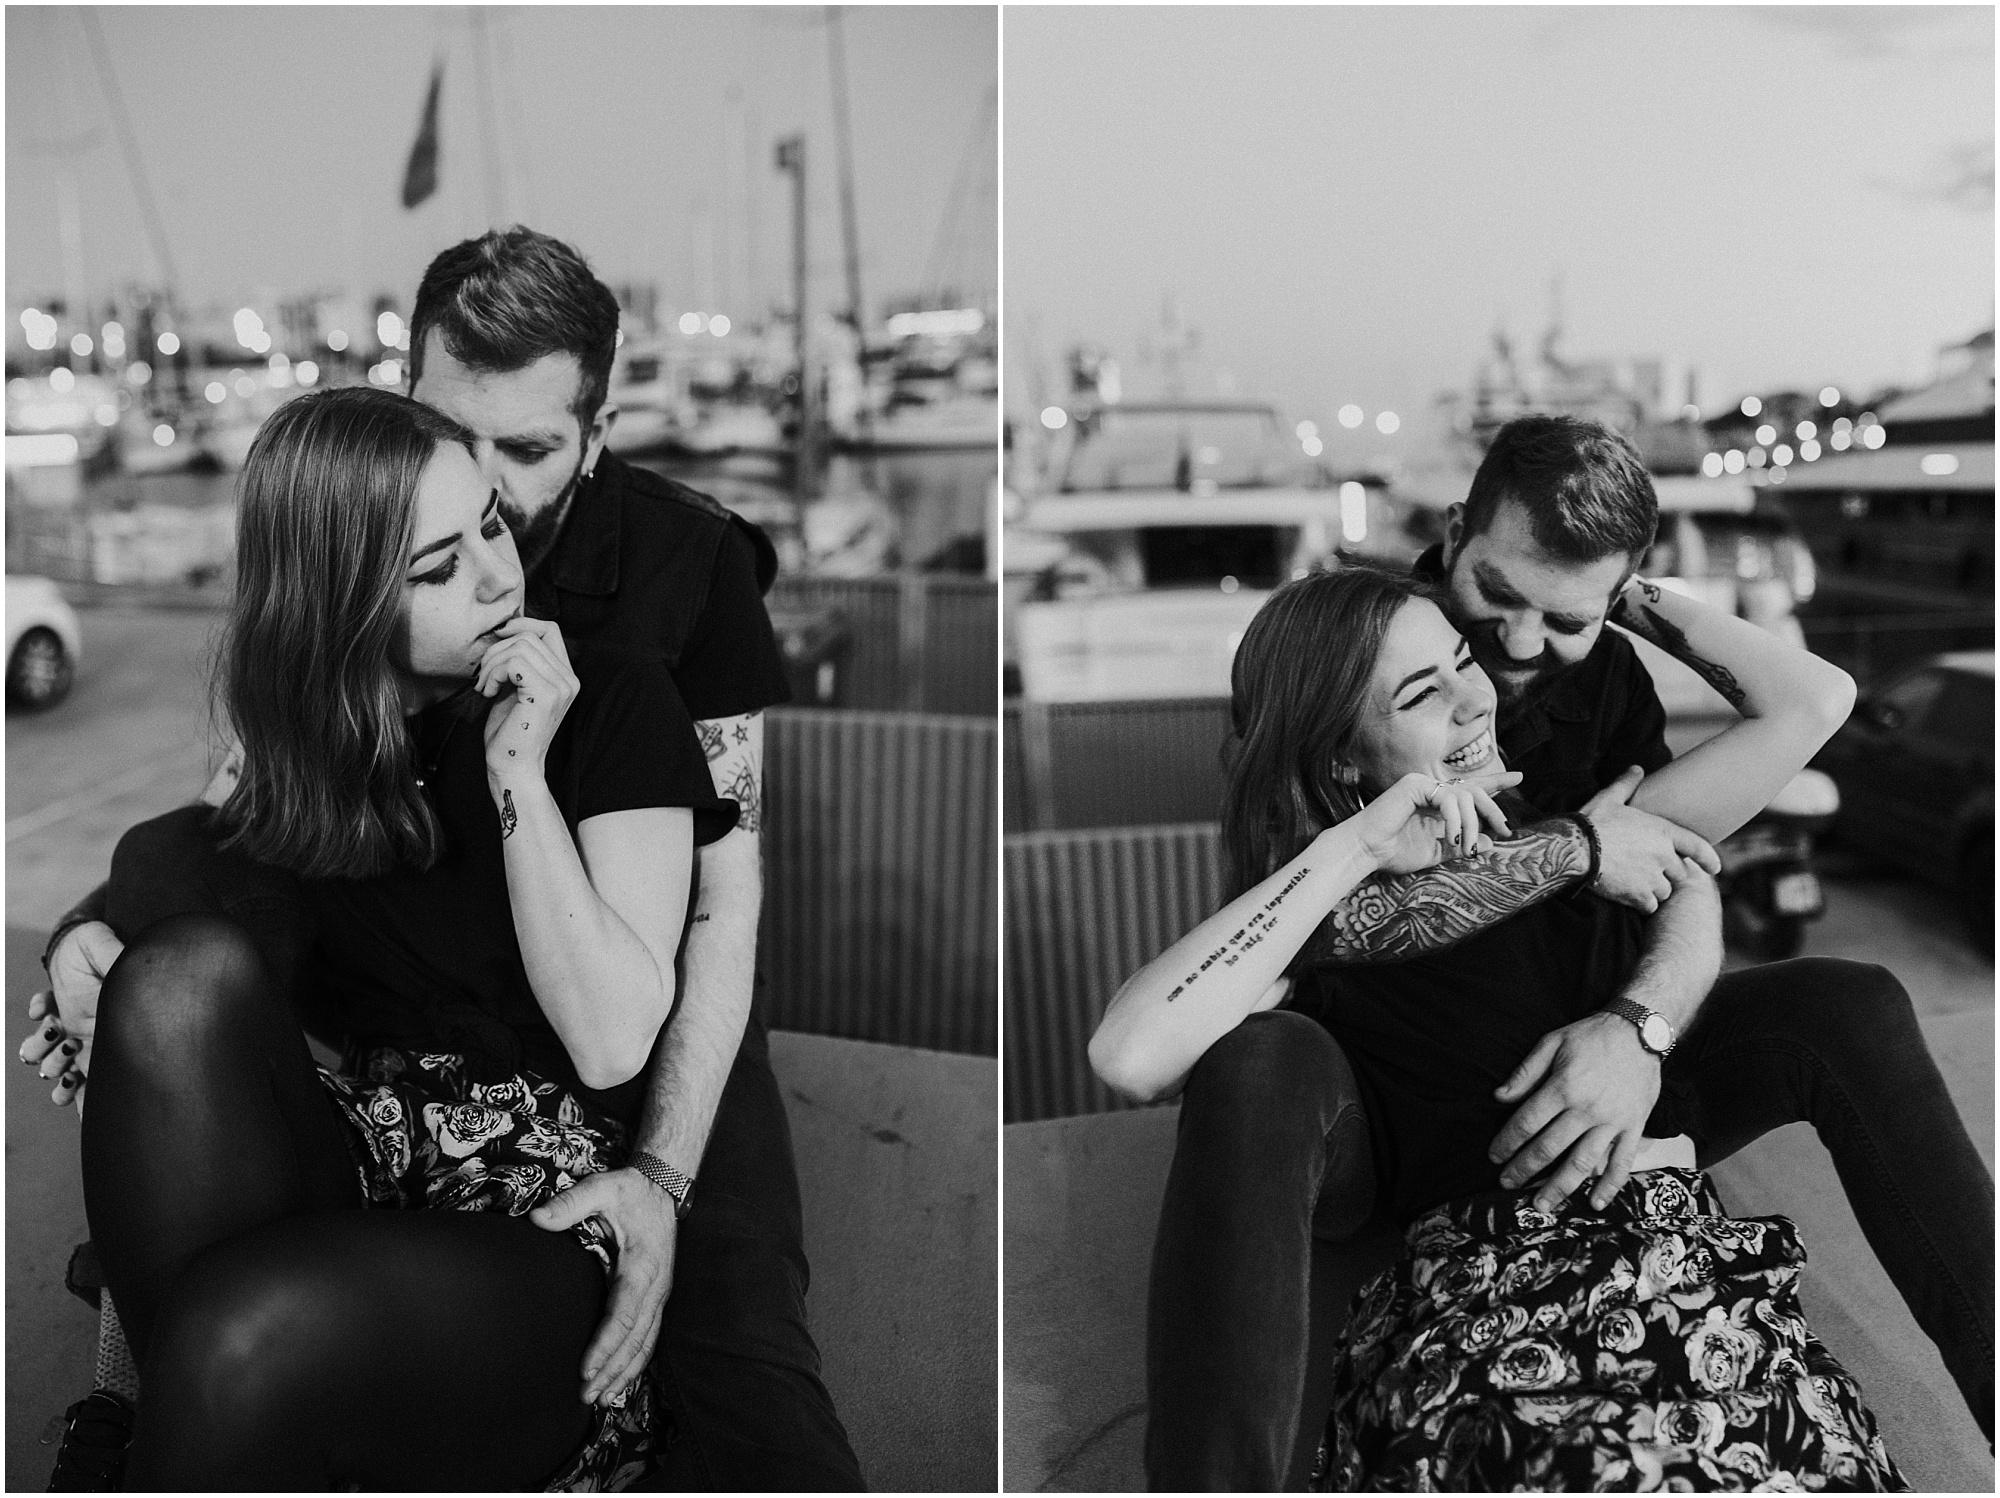 Kateryna-photos-photographer-mariage-boda-love-story-engagement-barcelona_0030.jpg